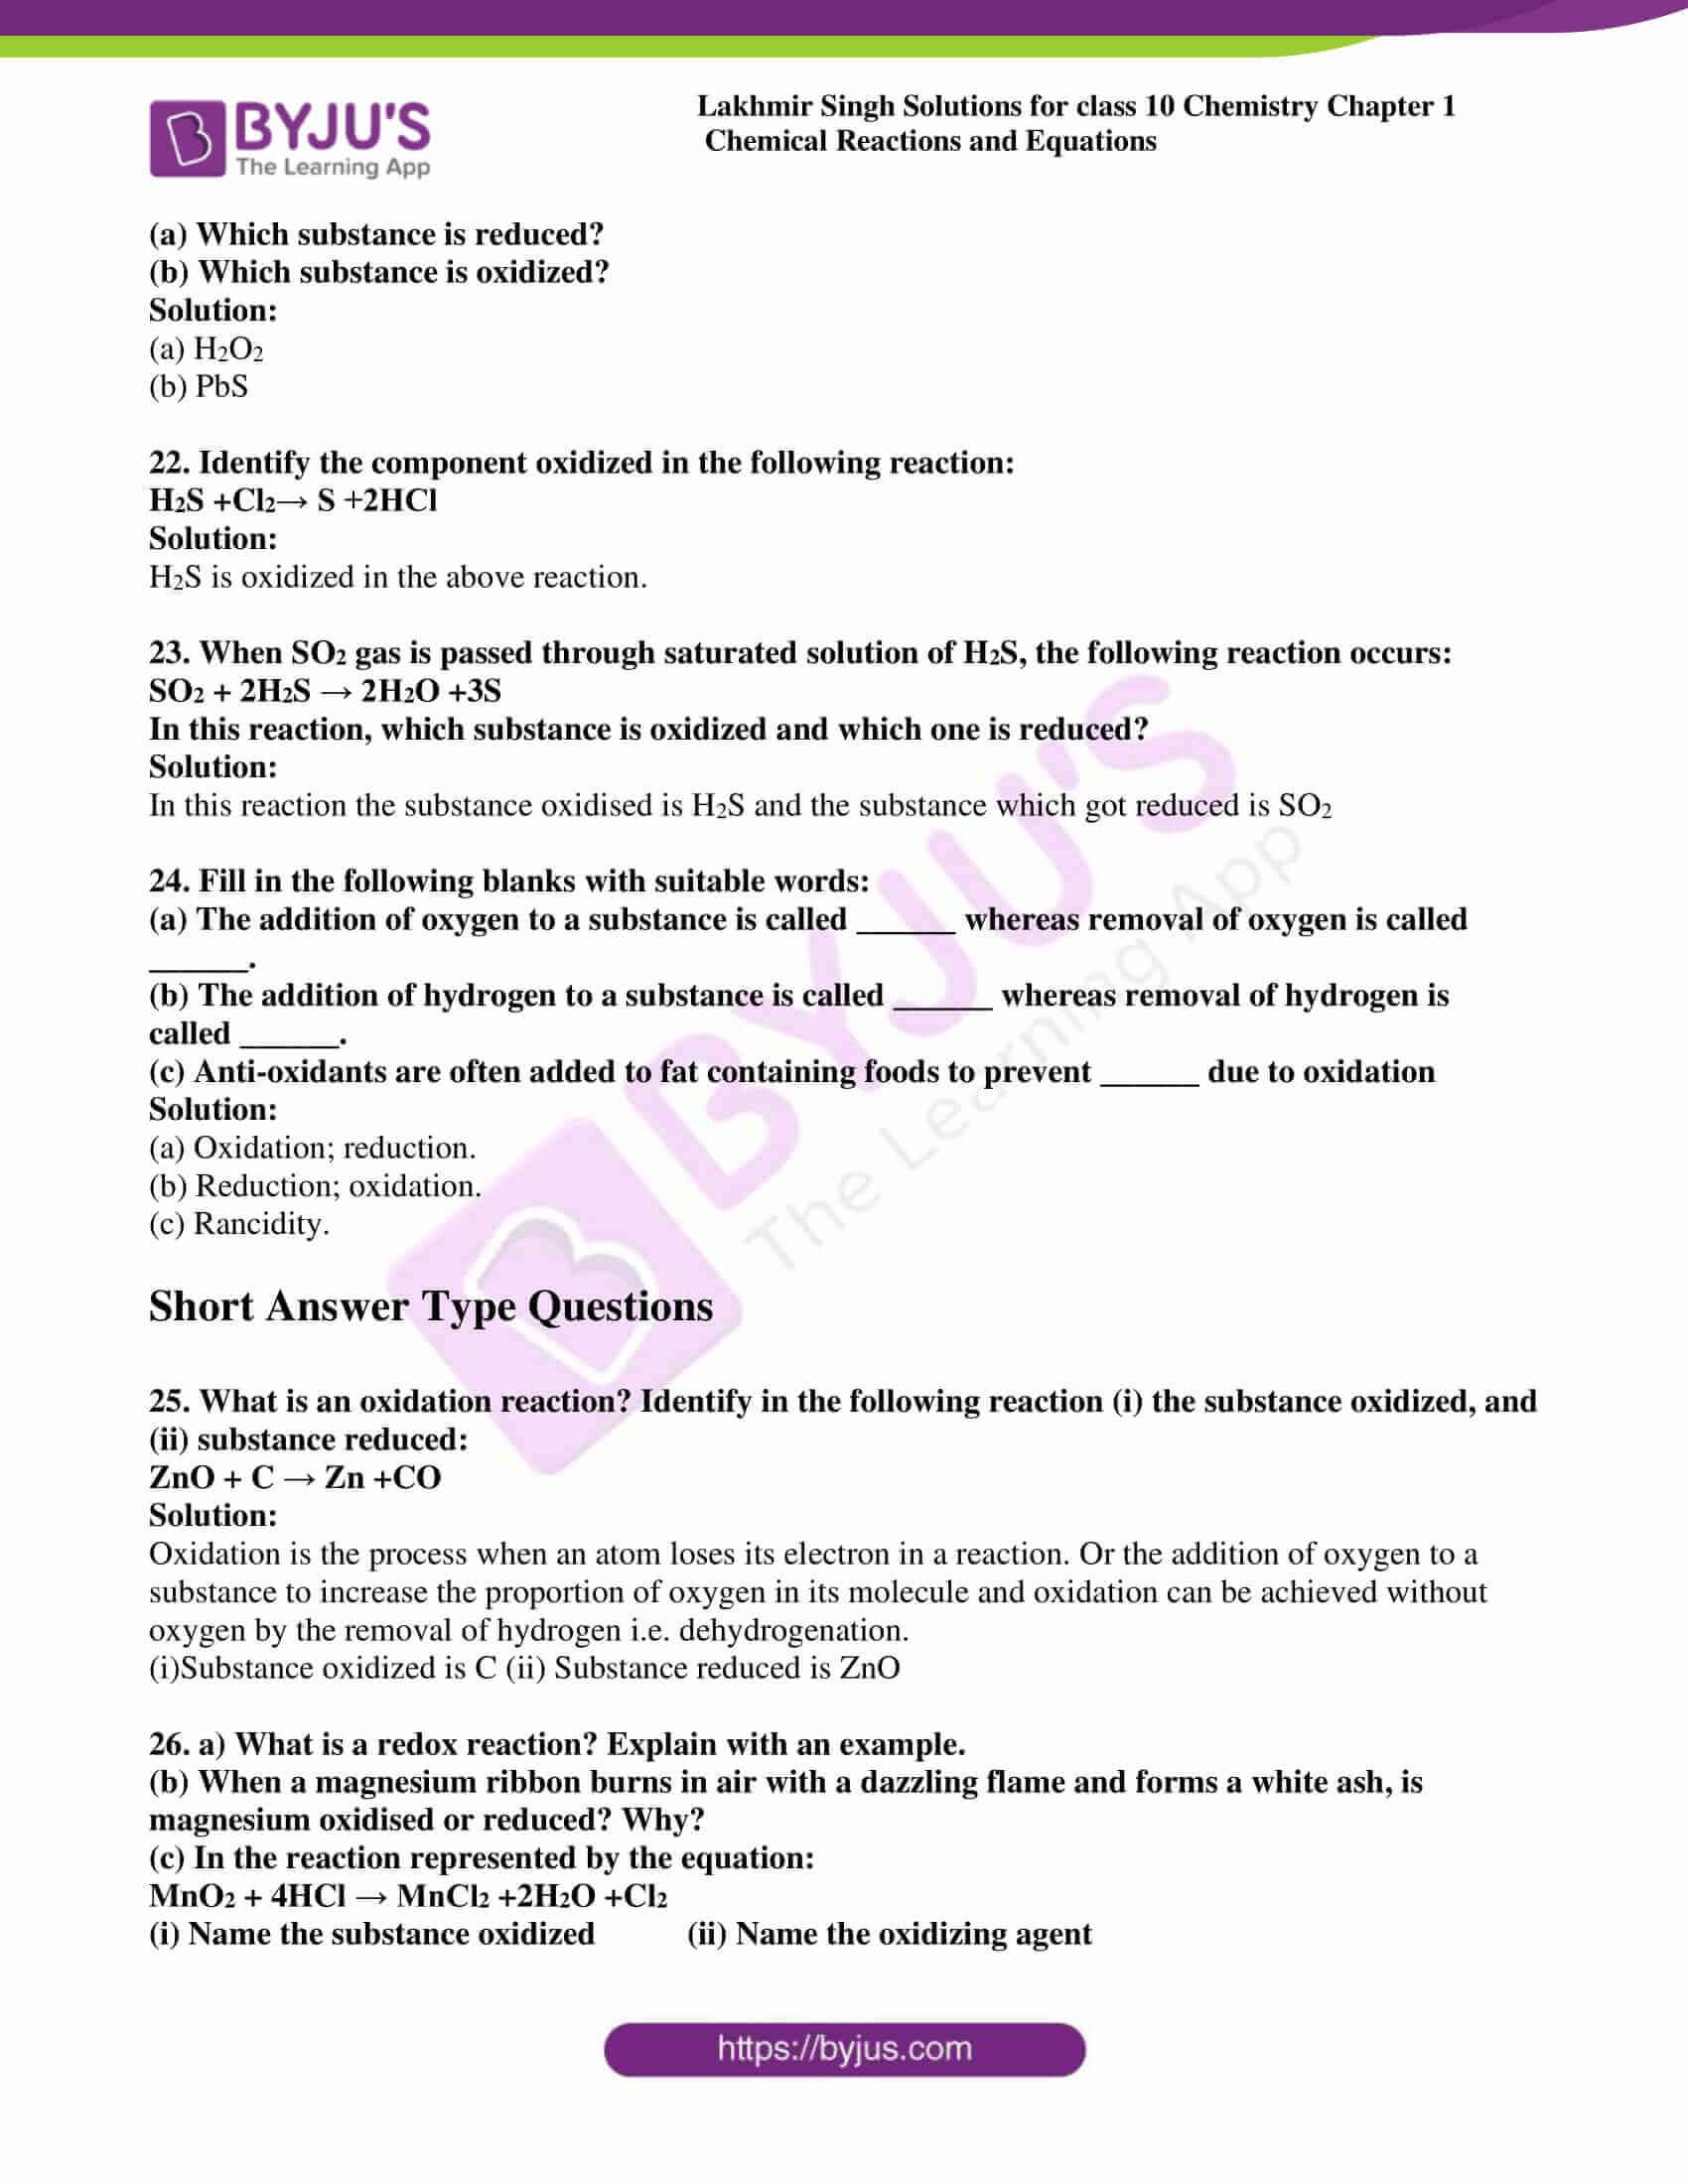 lakhmir singh sol class 10 che chapter 1 20